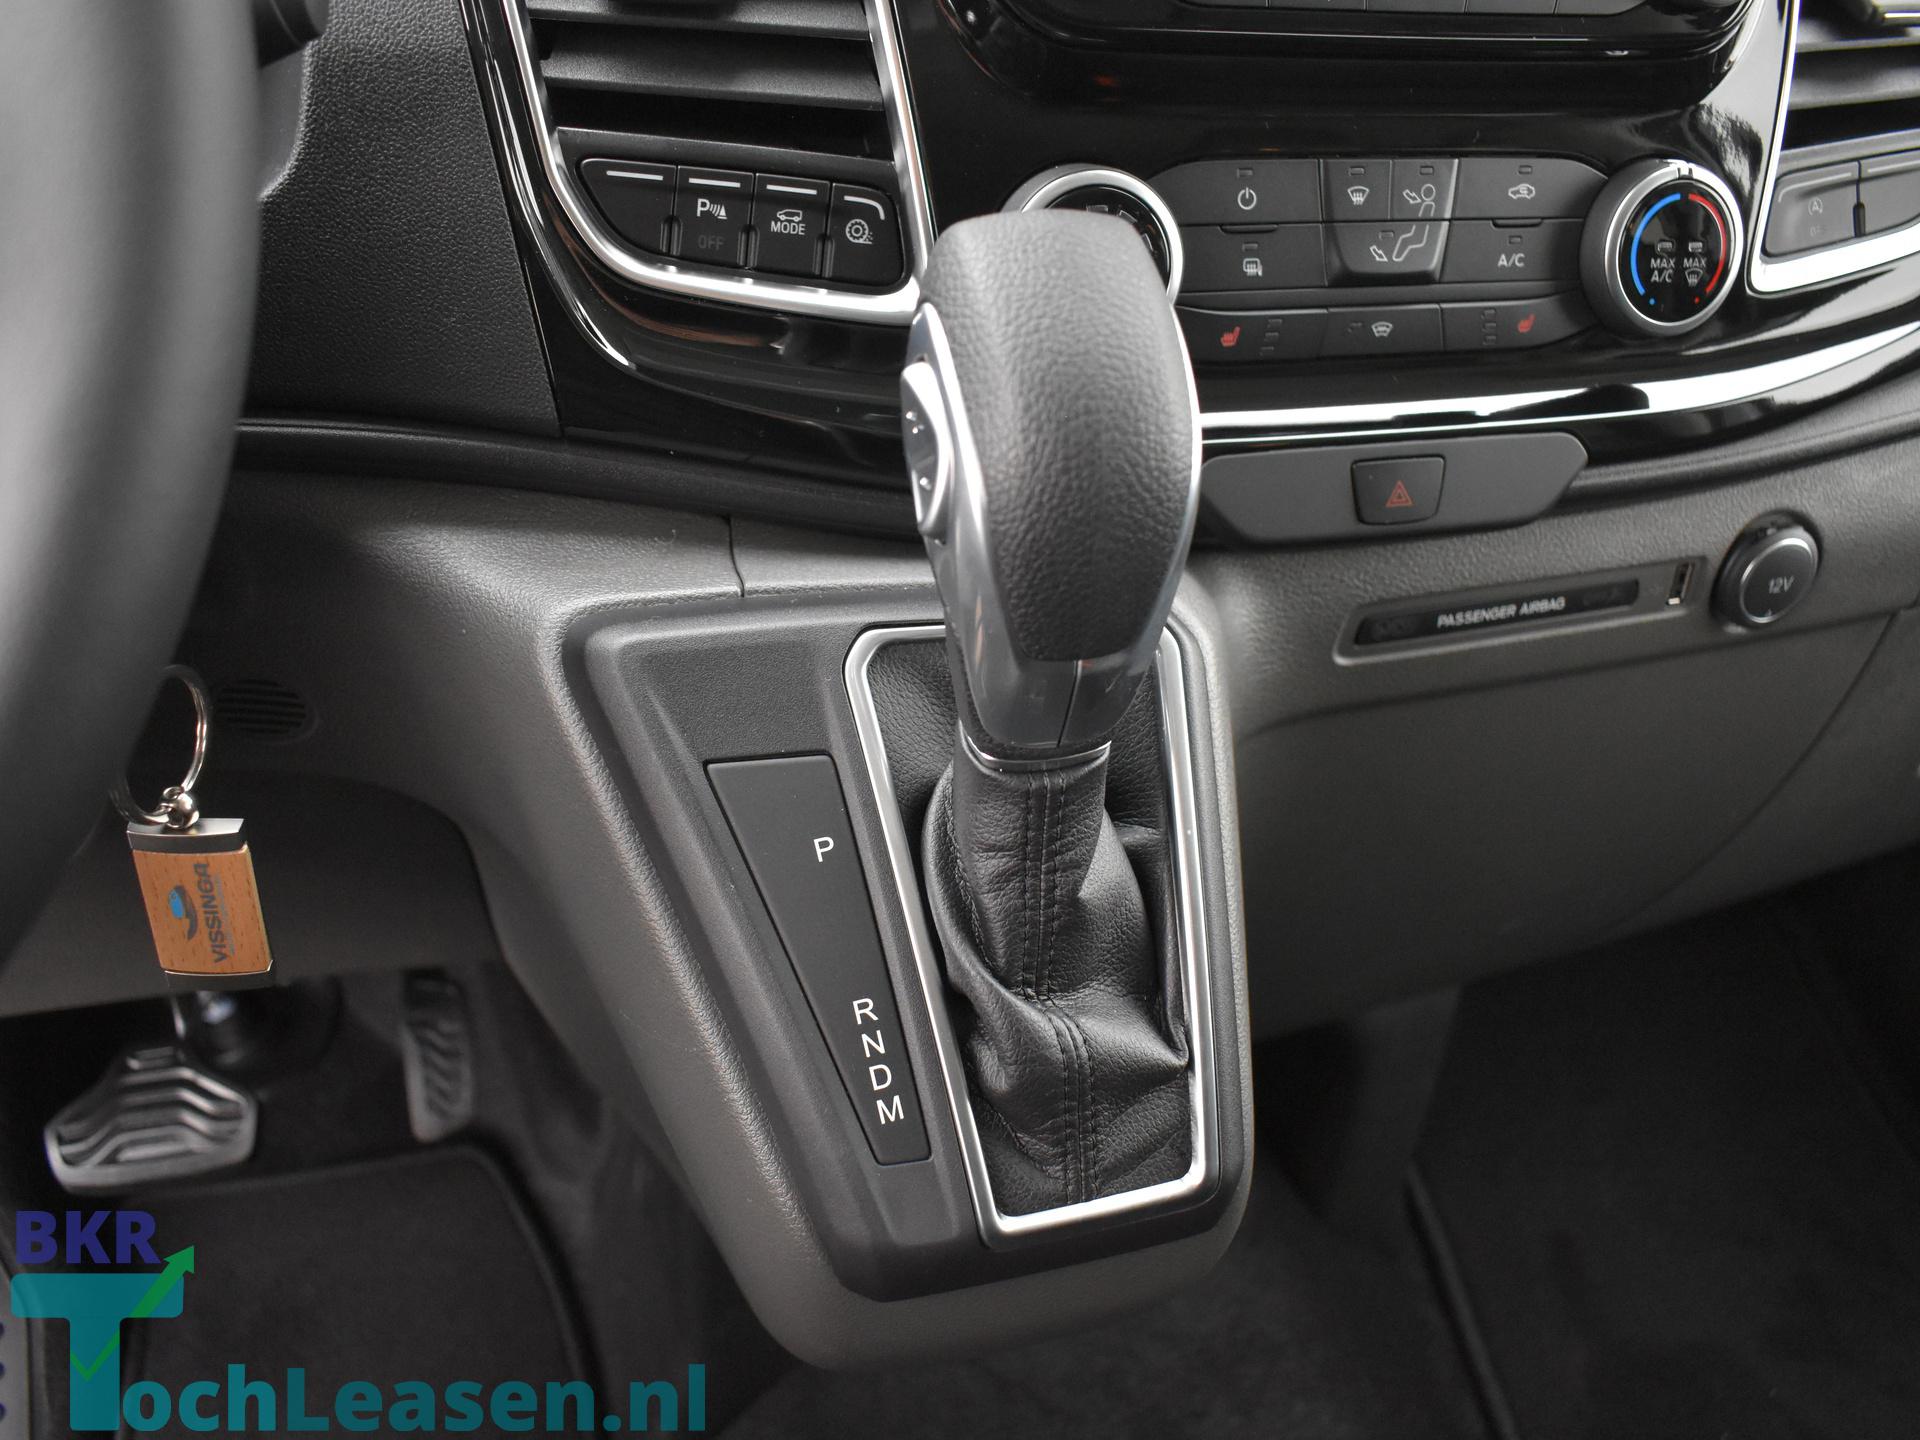 BKRtochleasen.nl - Ford Transit - Wit sport18